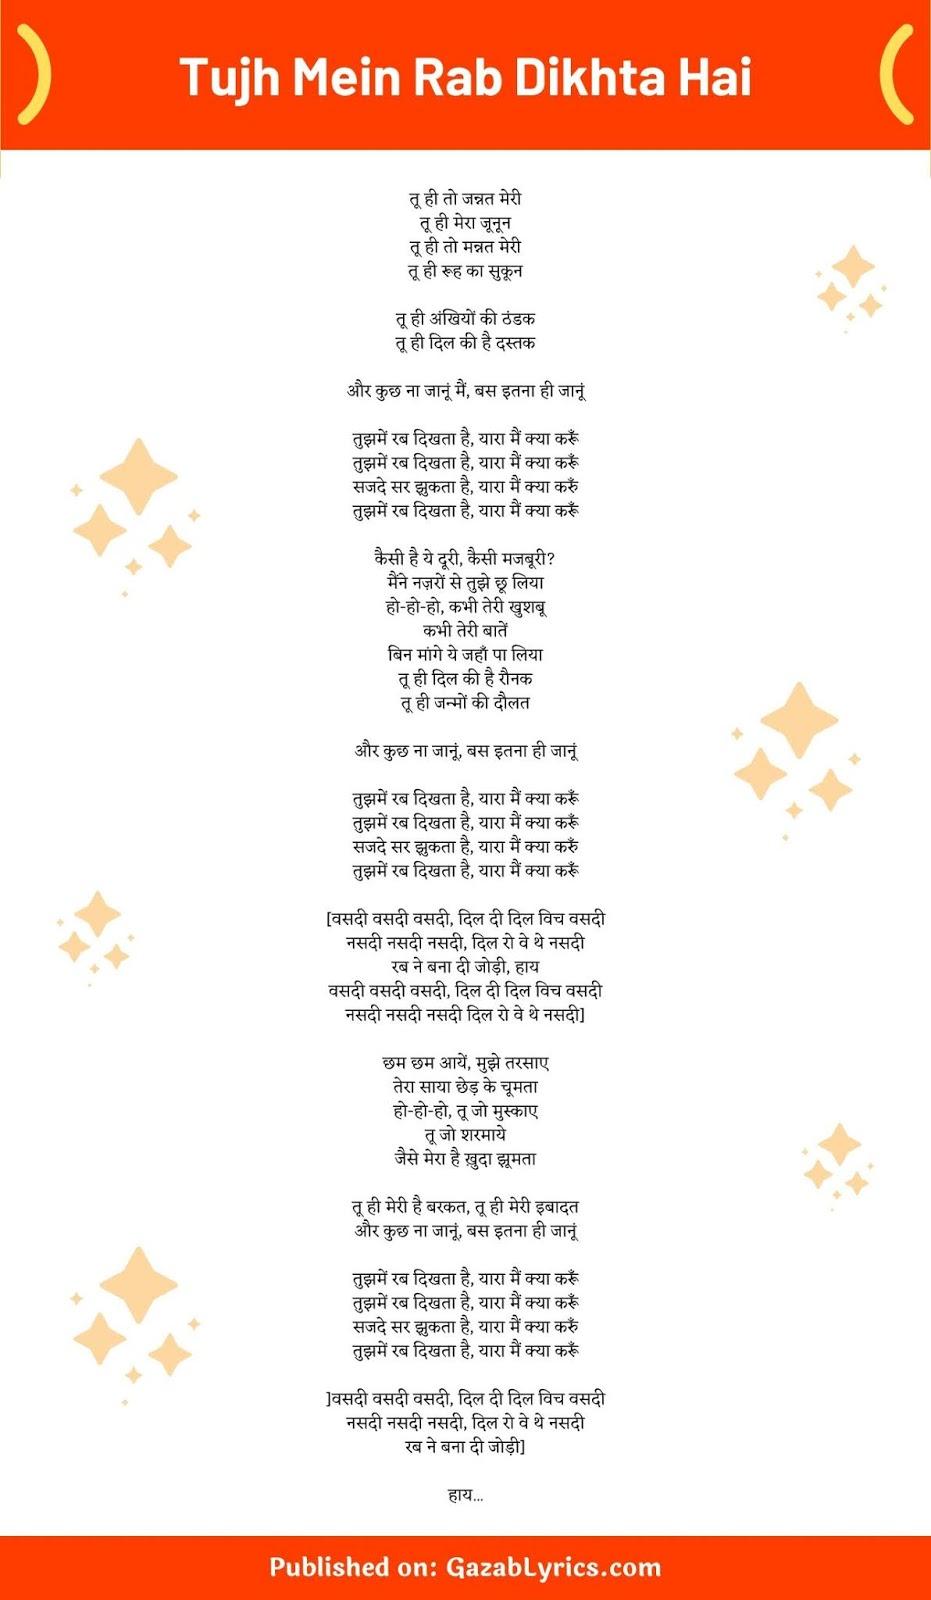 Tujh Mein Rab Dikhta Hai lyrics image